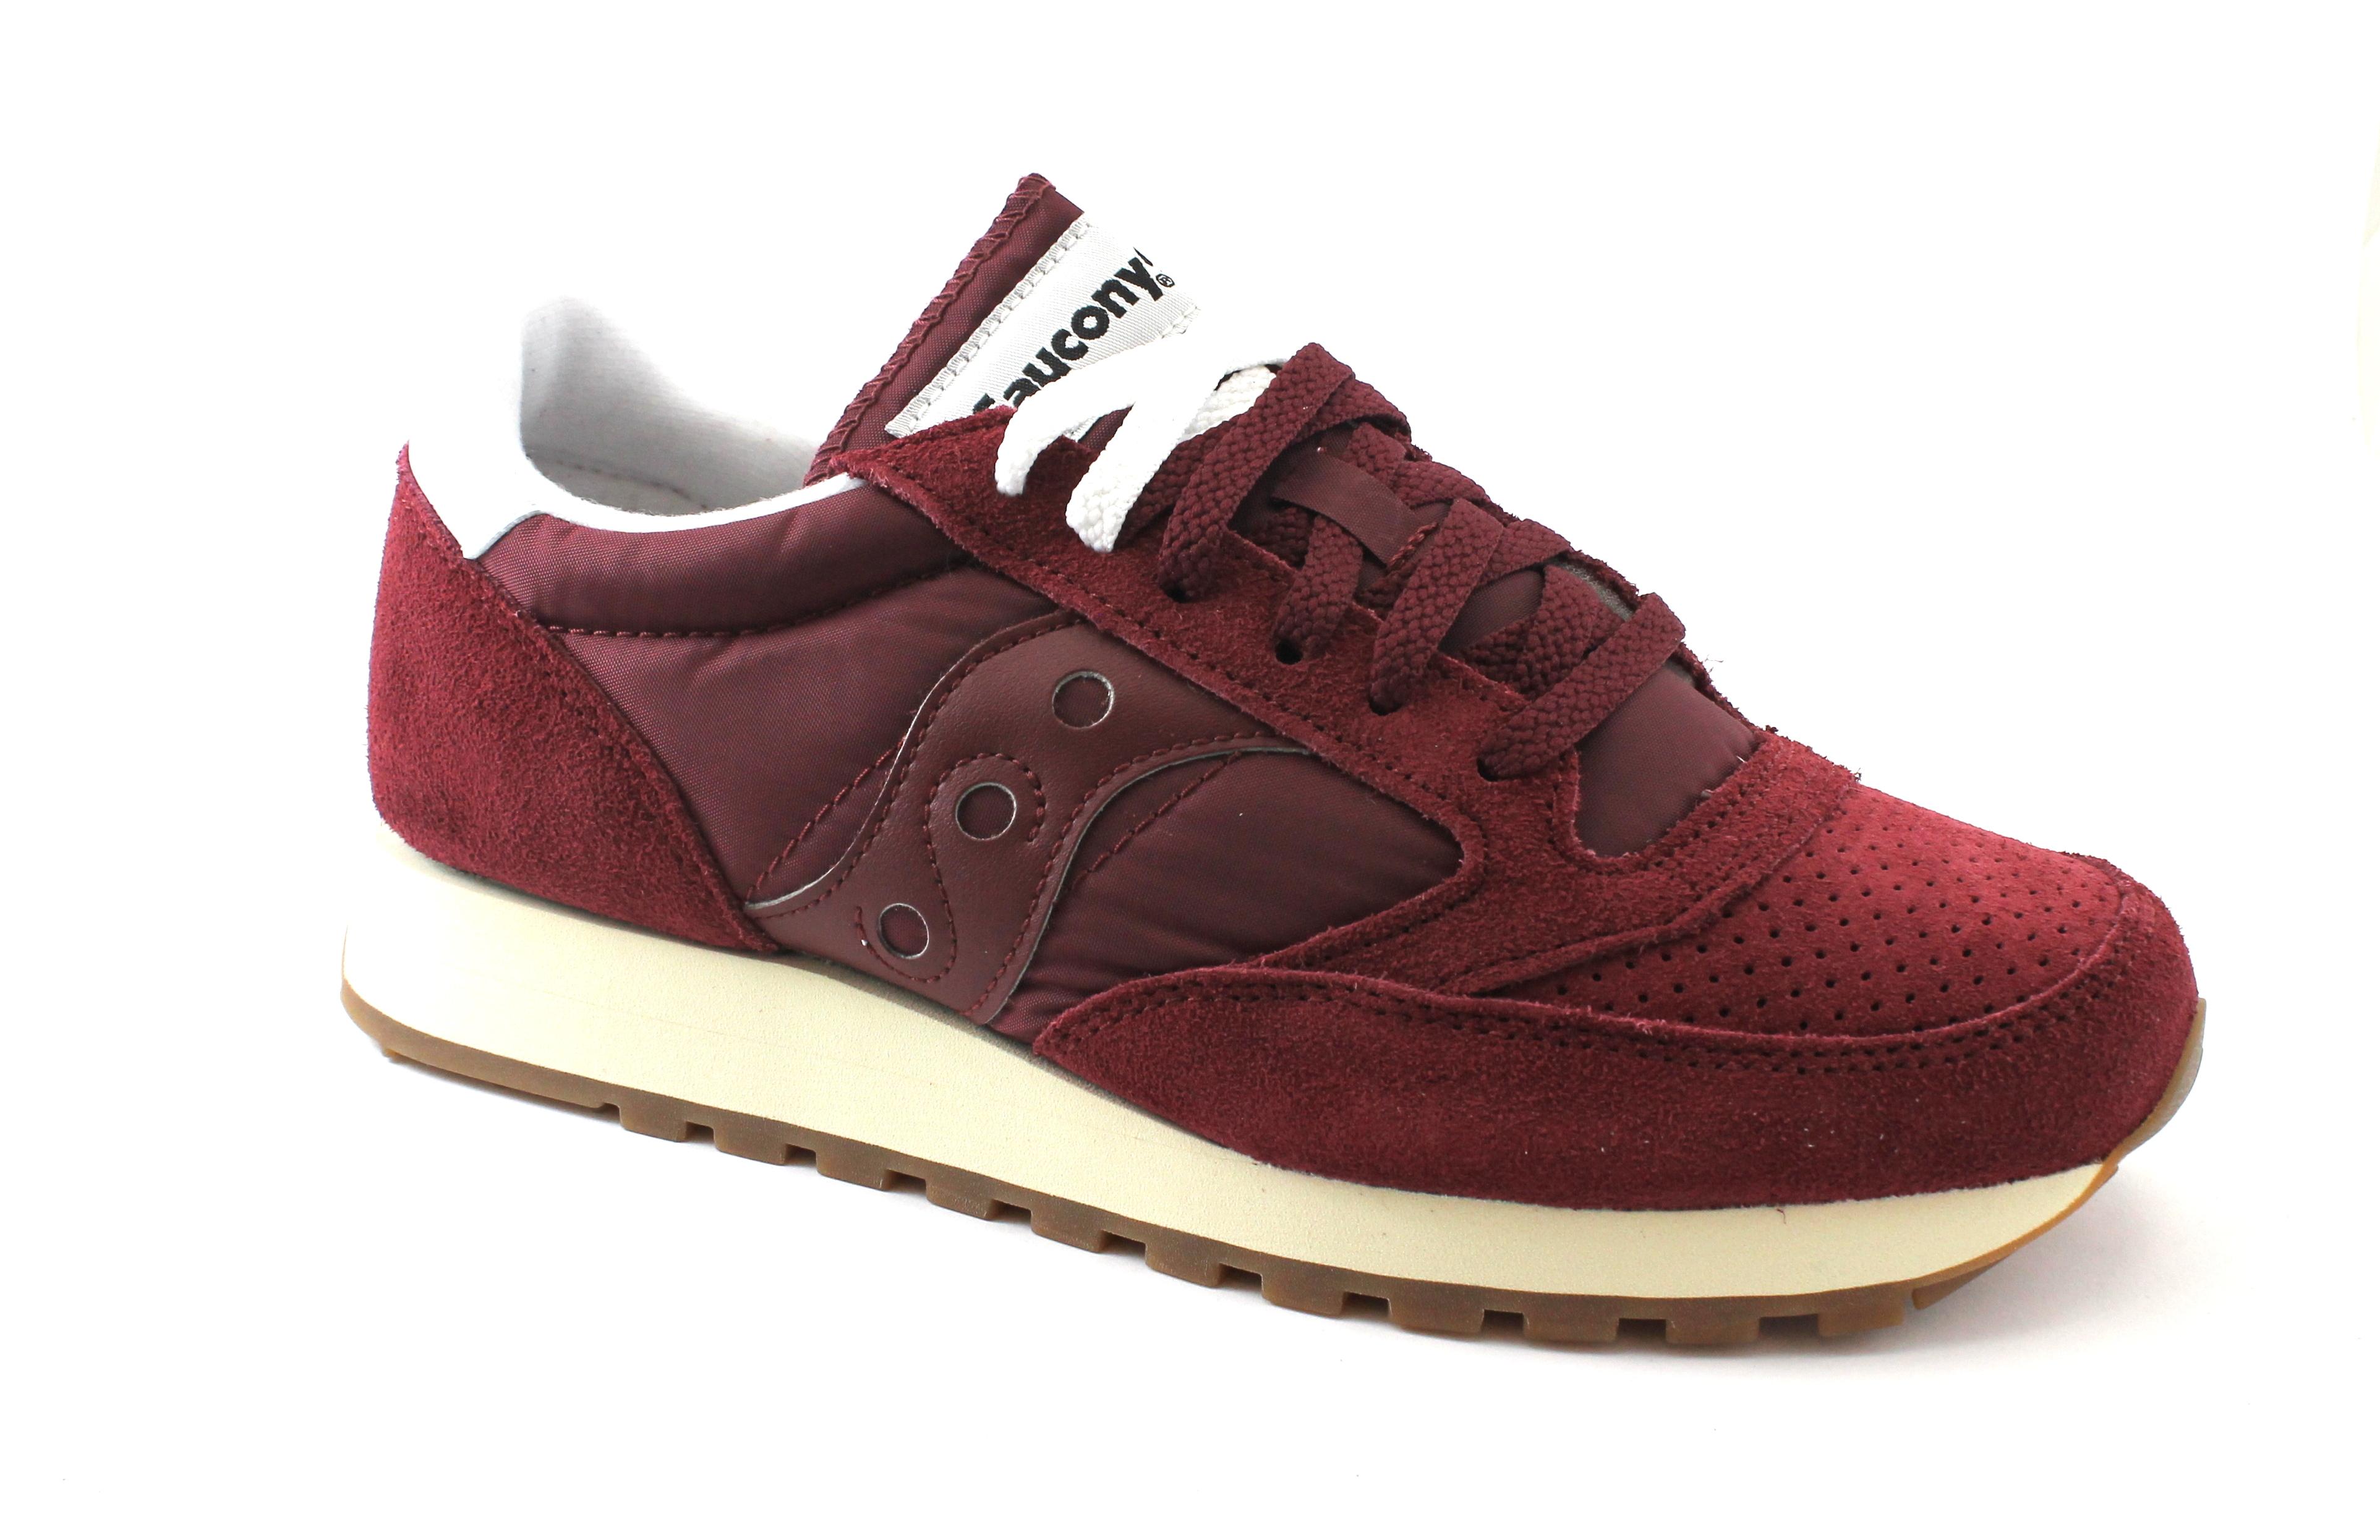 SAUCONY S70419-1 JAZZ uomo ORIGINAL vintage bordeaux scarpe uomo JAZZ sneakers e7390b